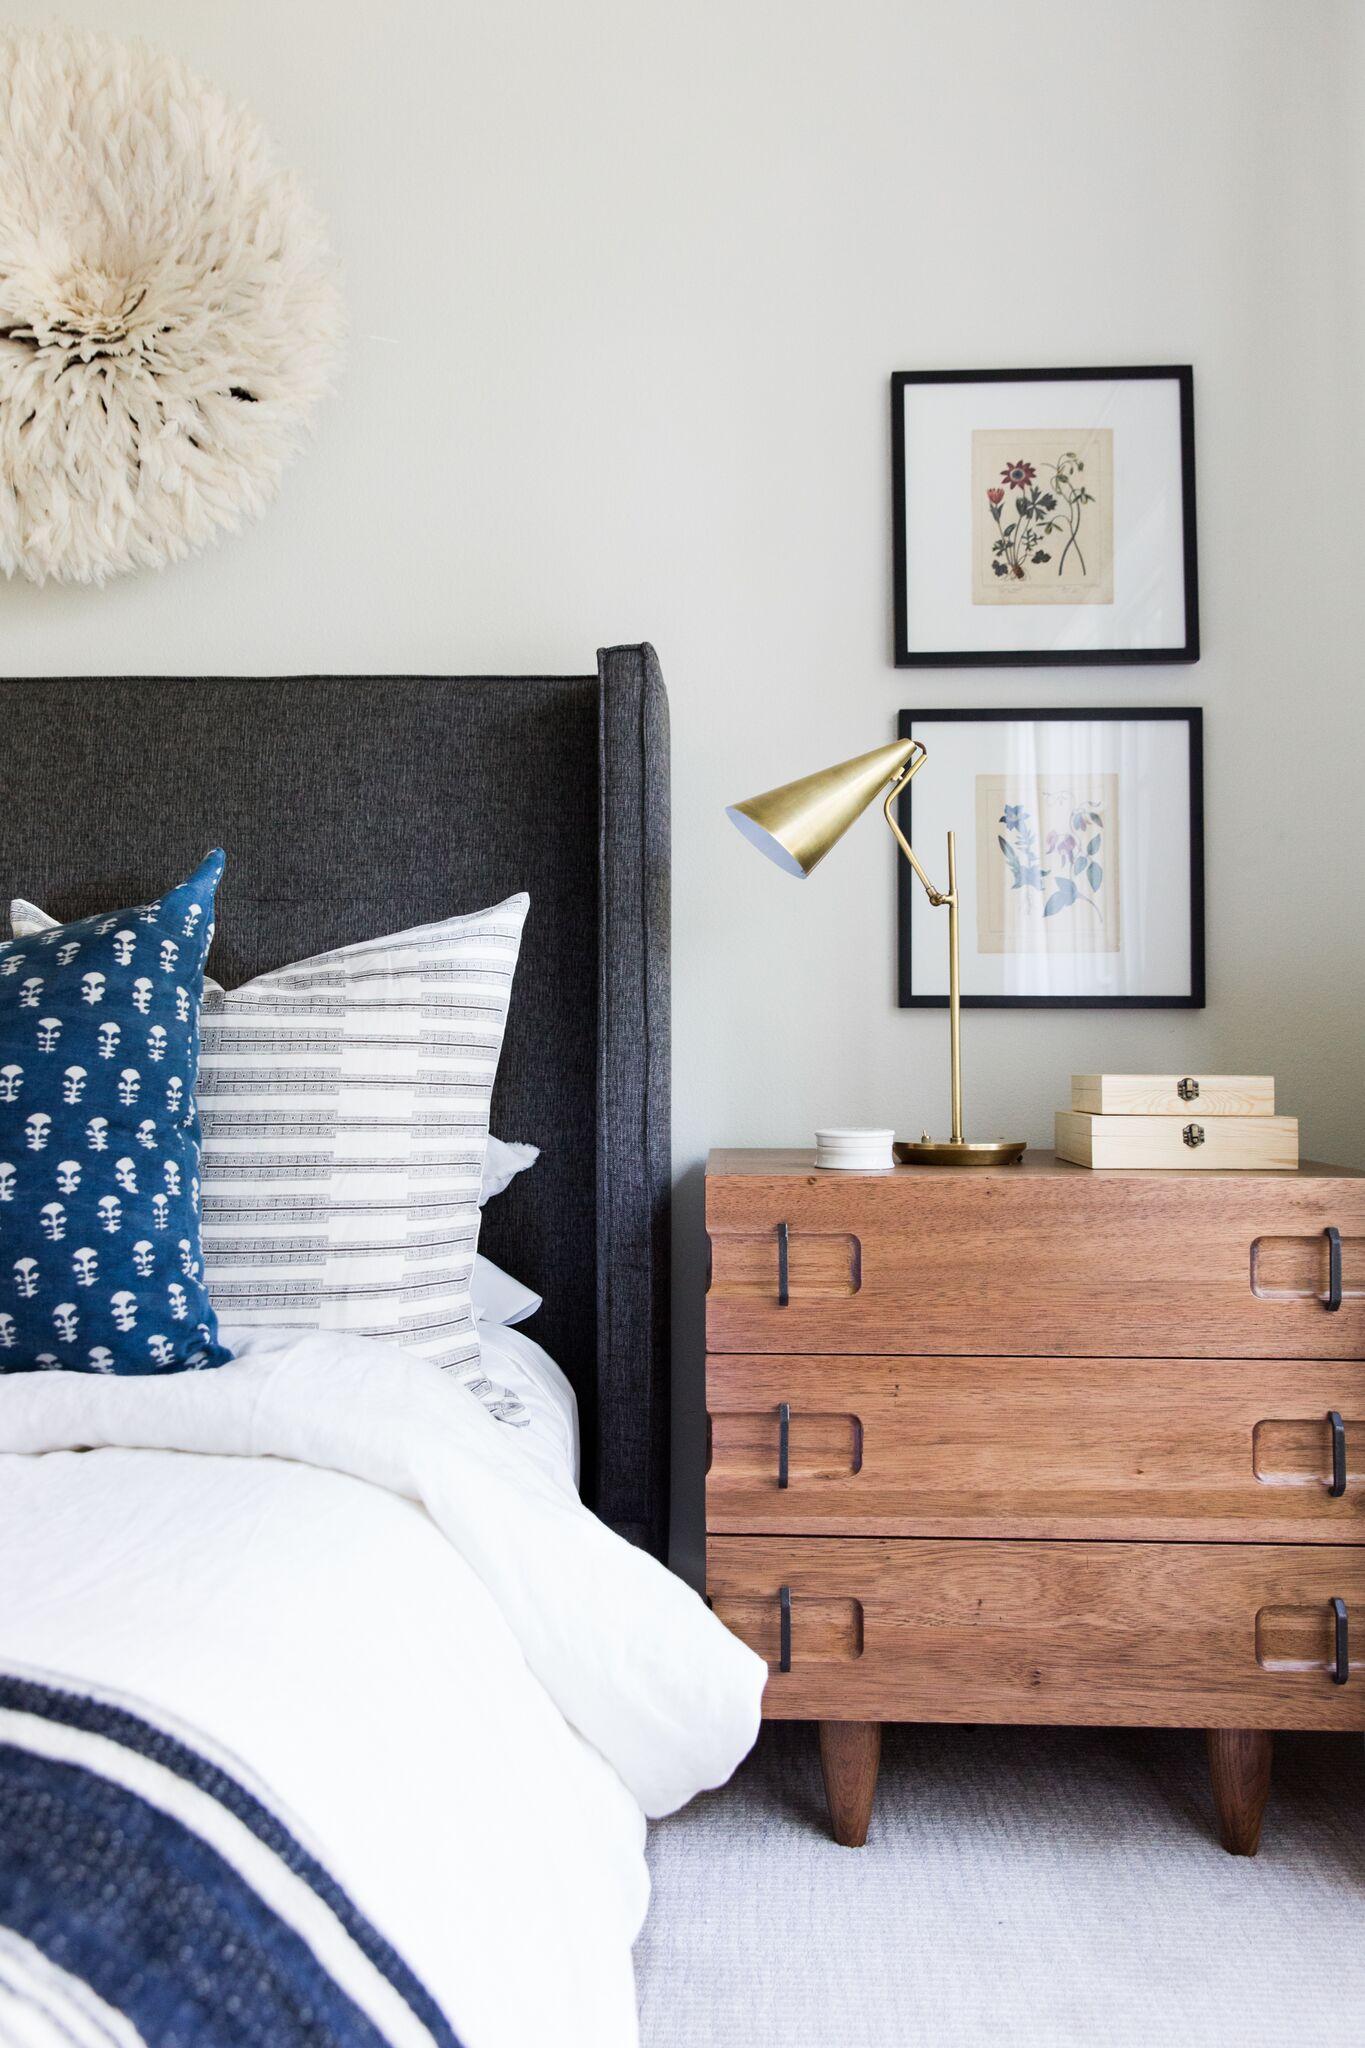 3Coastal+Bohemian+Guest+Bedroom+with+Vintage+Rug+and+Botanical+Prints.jpg